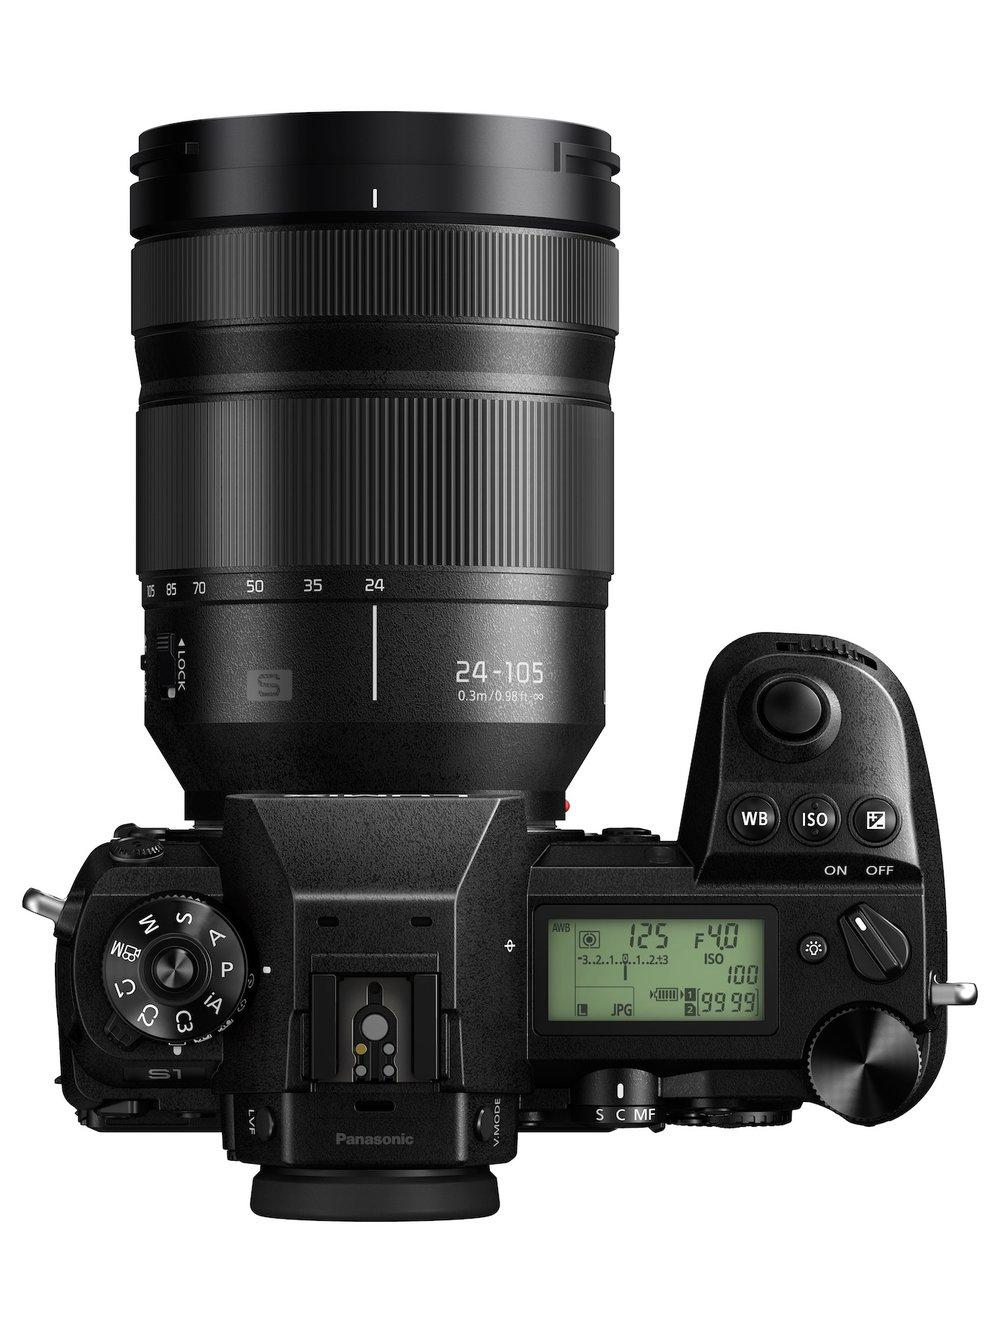 067-FY2018-Panasonic-LUMIX-S1ME-Produkt-oben.jpg